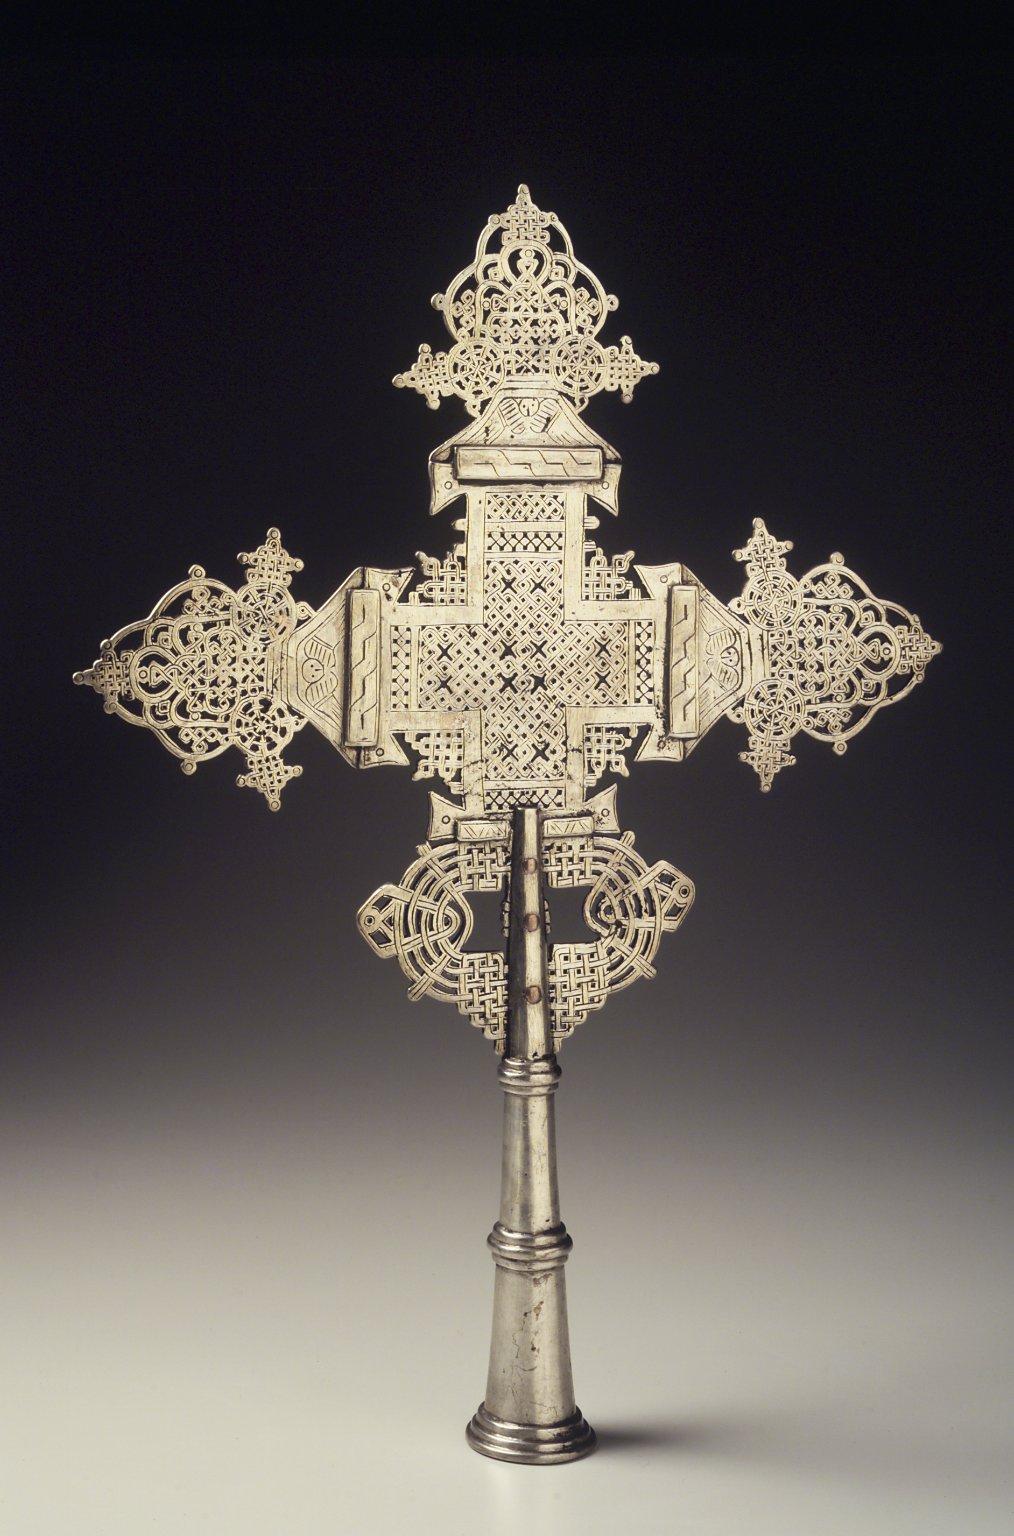 Brooklyn_Museum_2000.123.1_Processional_Cross.jpg